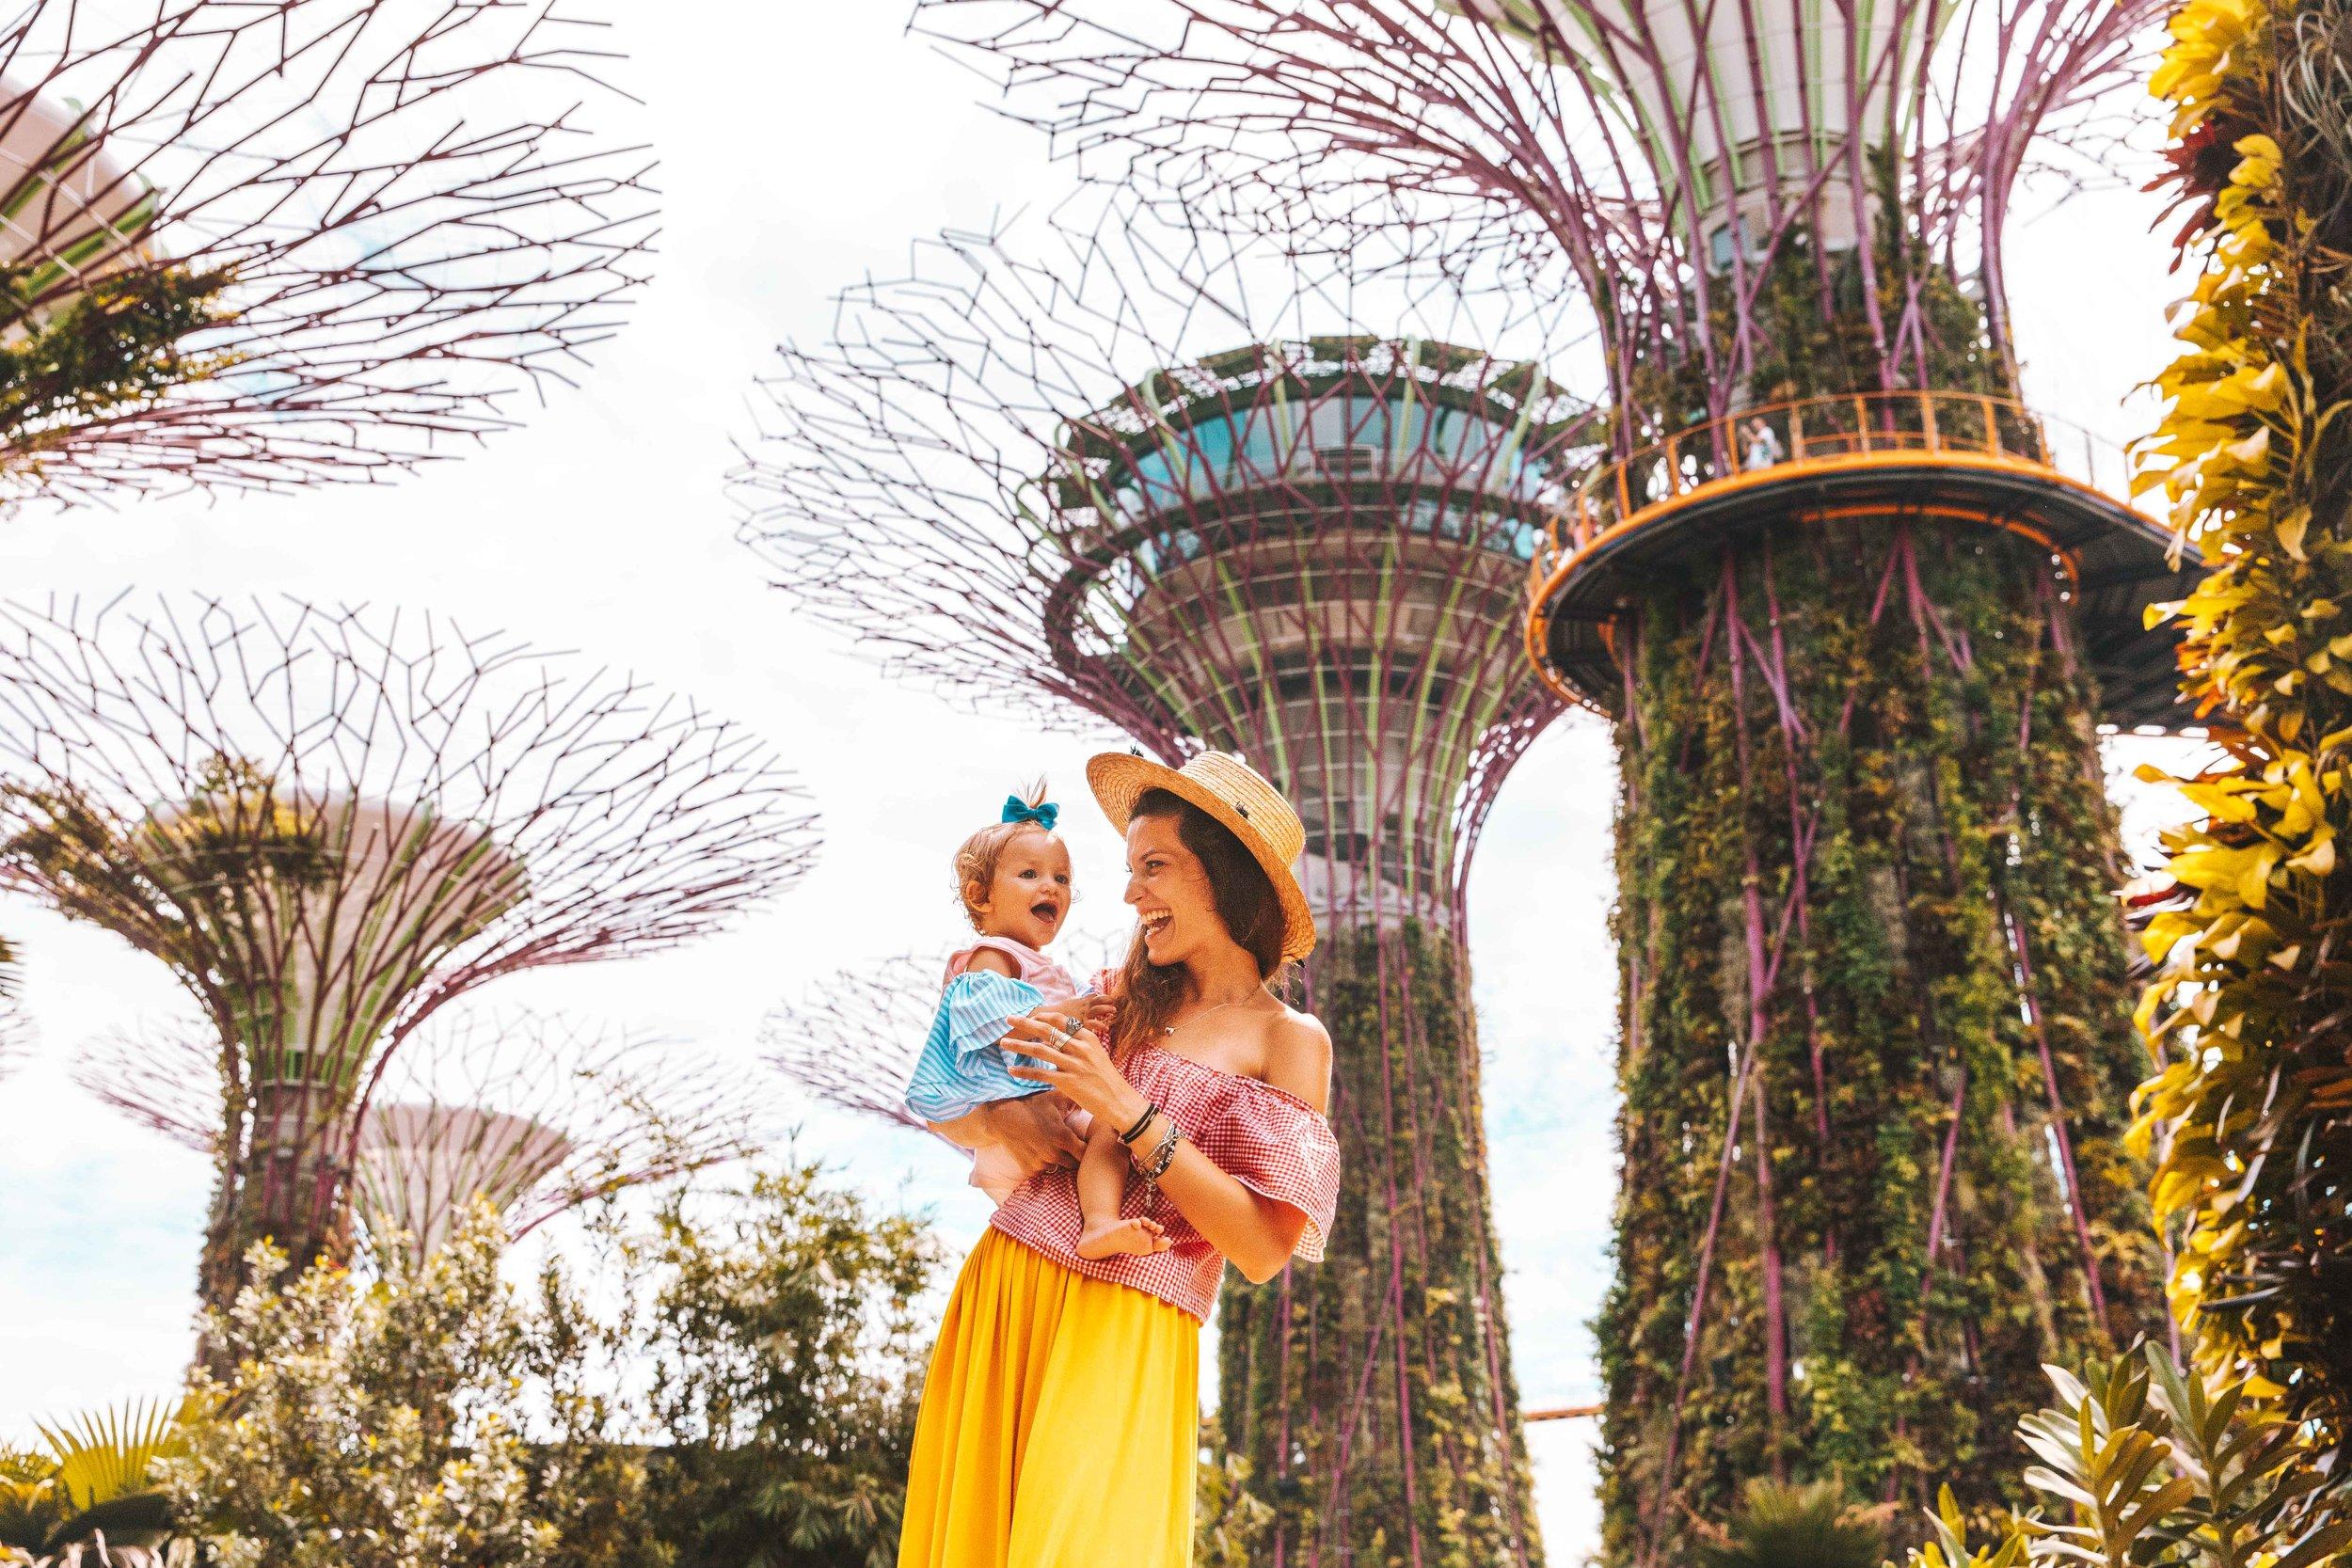 Incontri ragazza cinese a Singapore